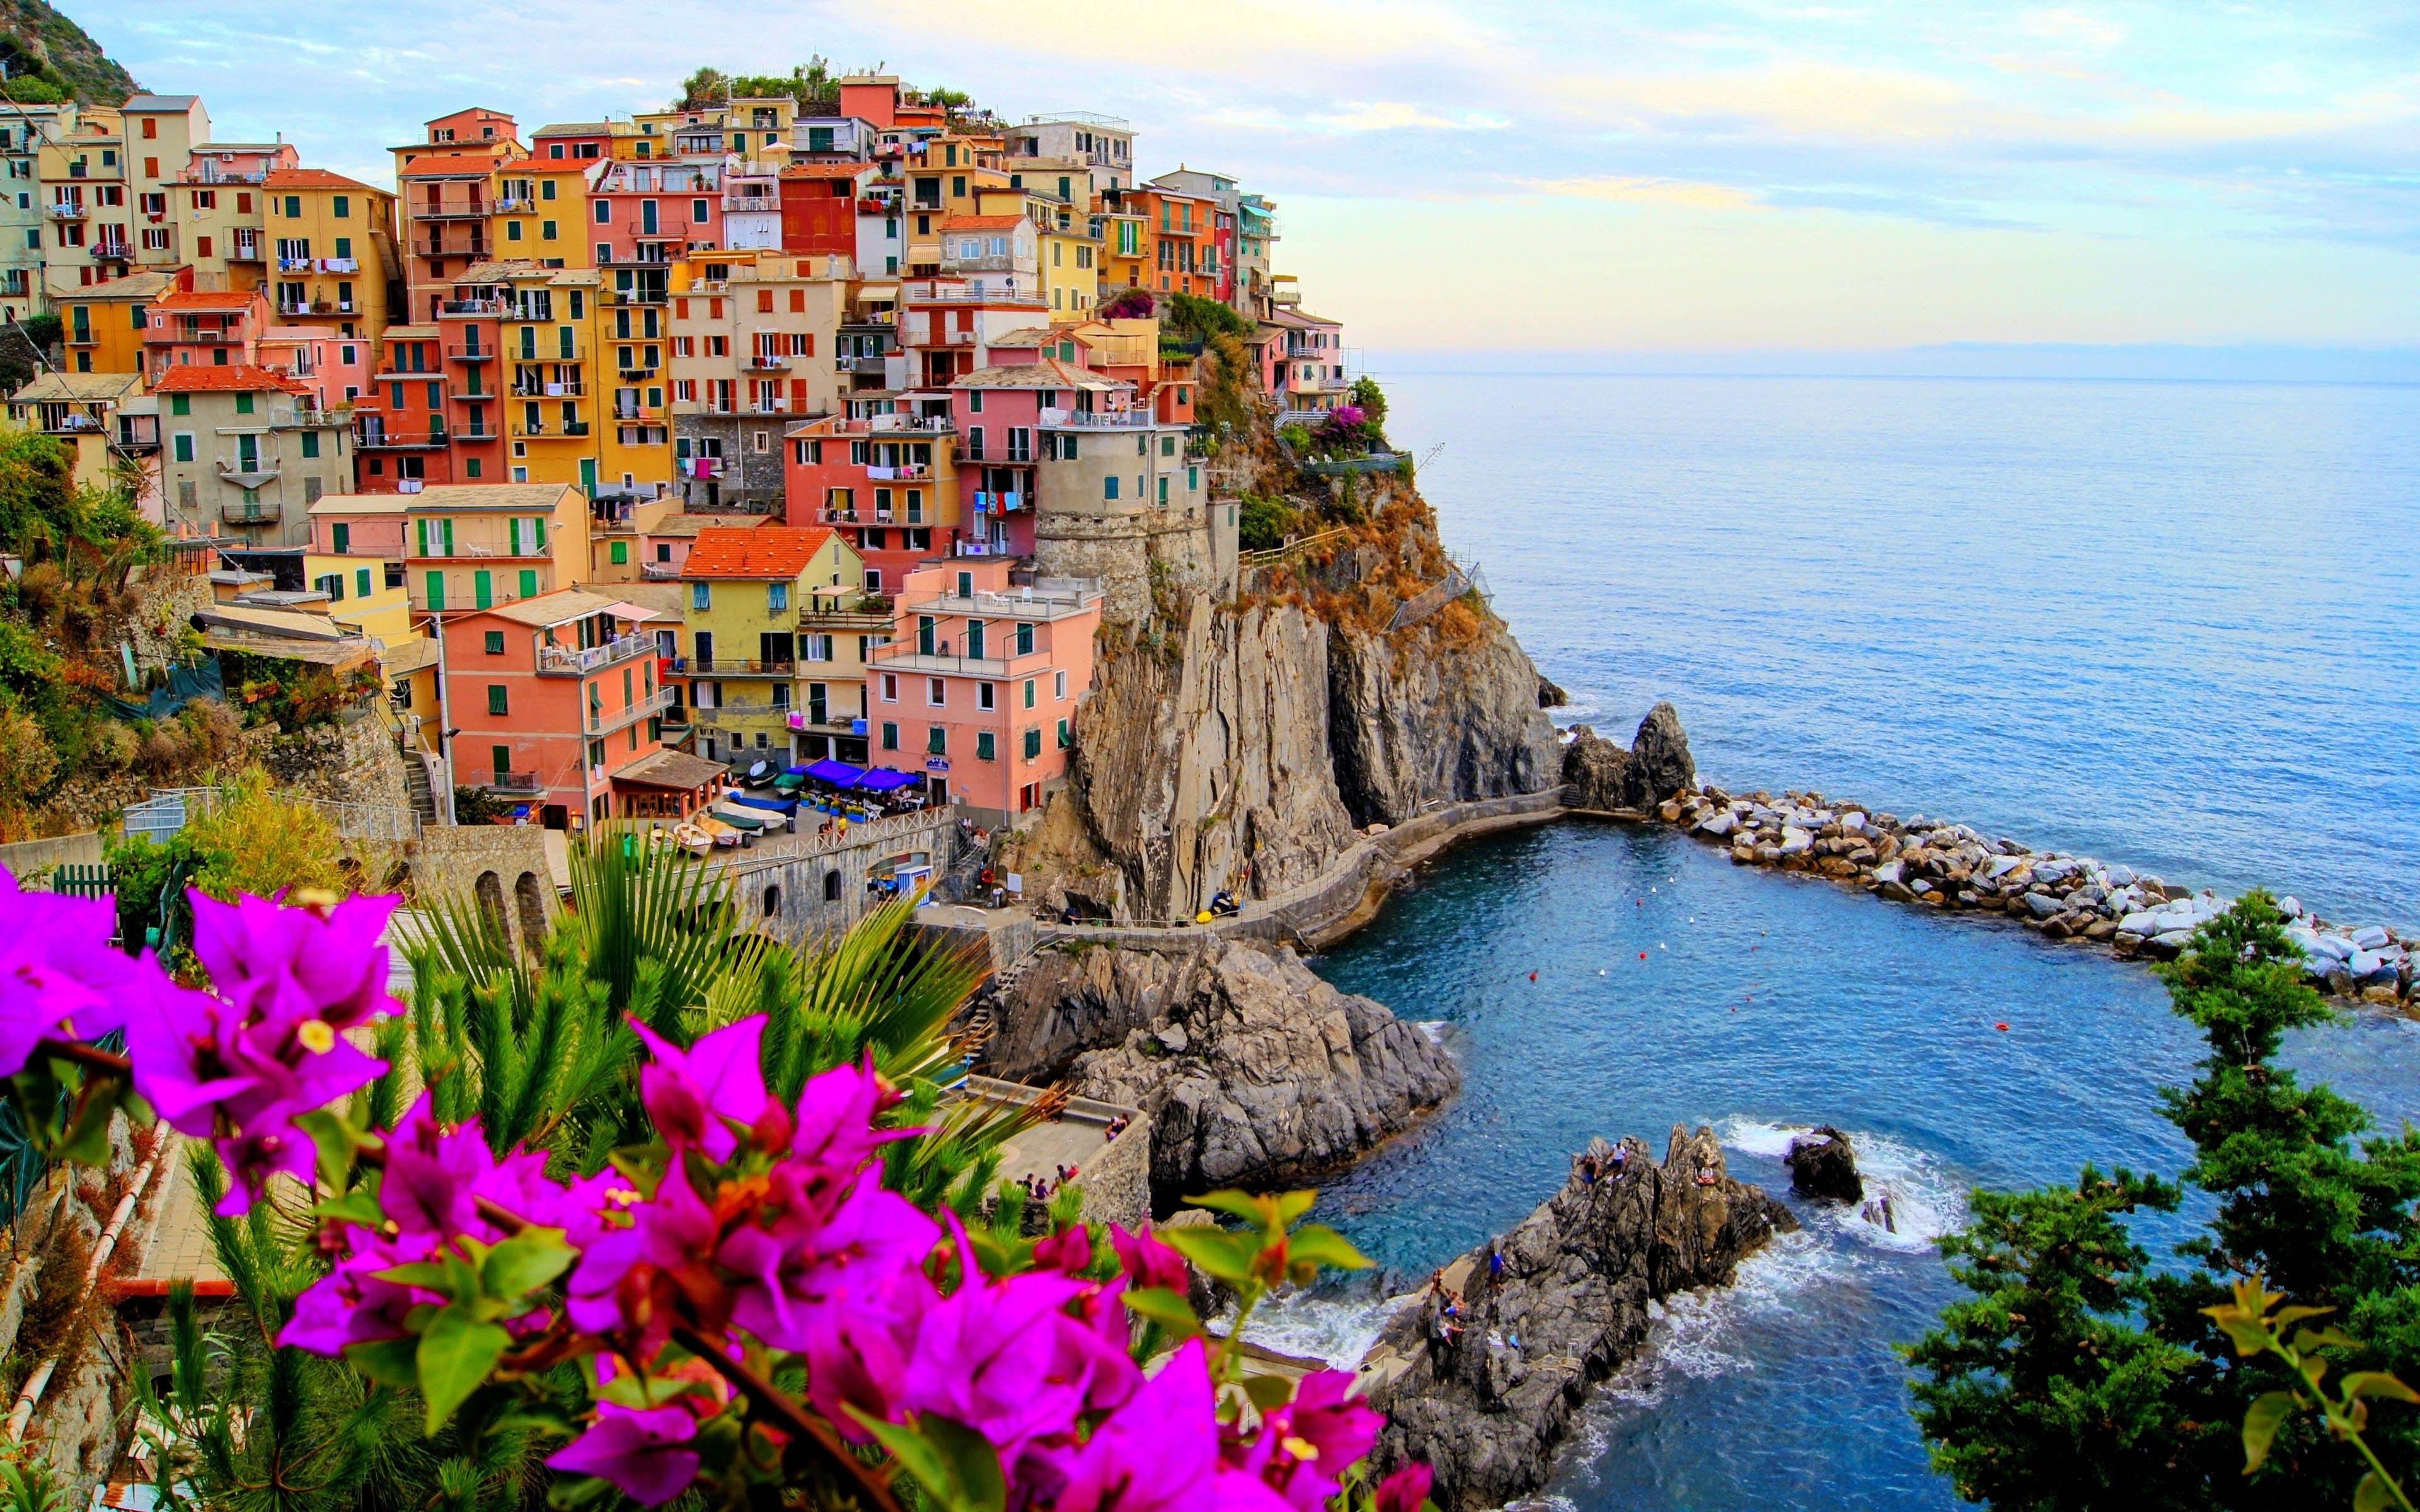 Italy Landscape City House Building Colorful Water Manarola 4k Wallpaper Hdwallpaper Desktop Summer Travel Travel Photos Travel